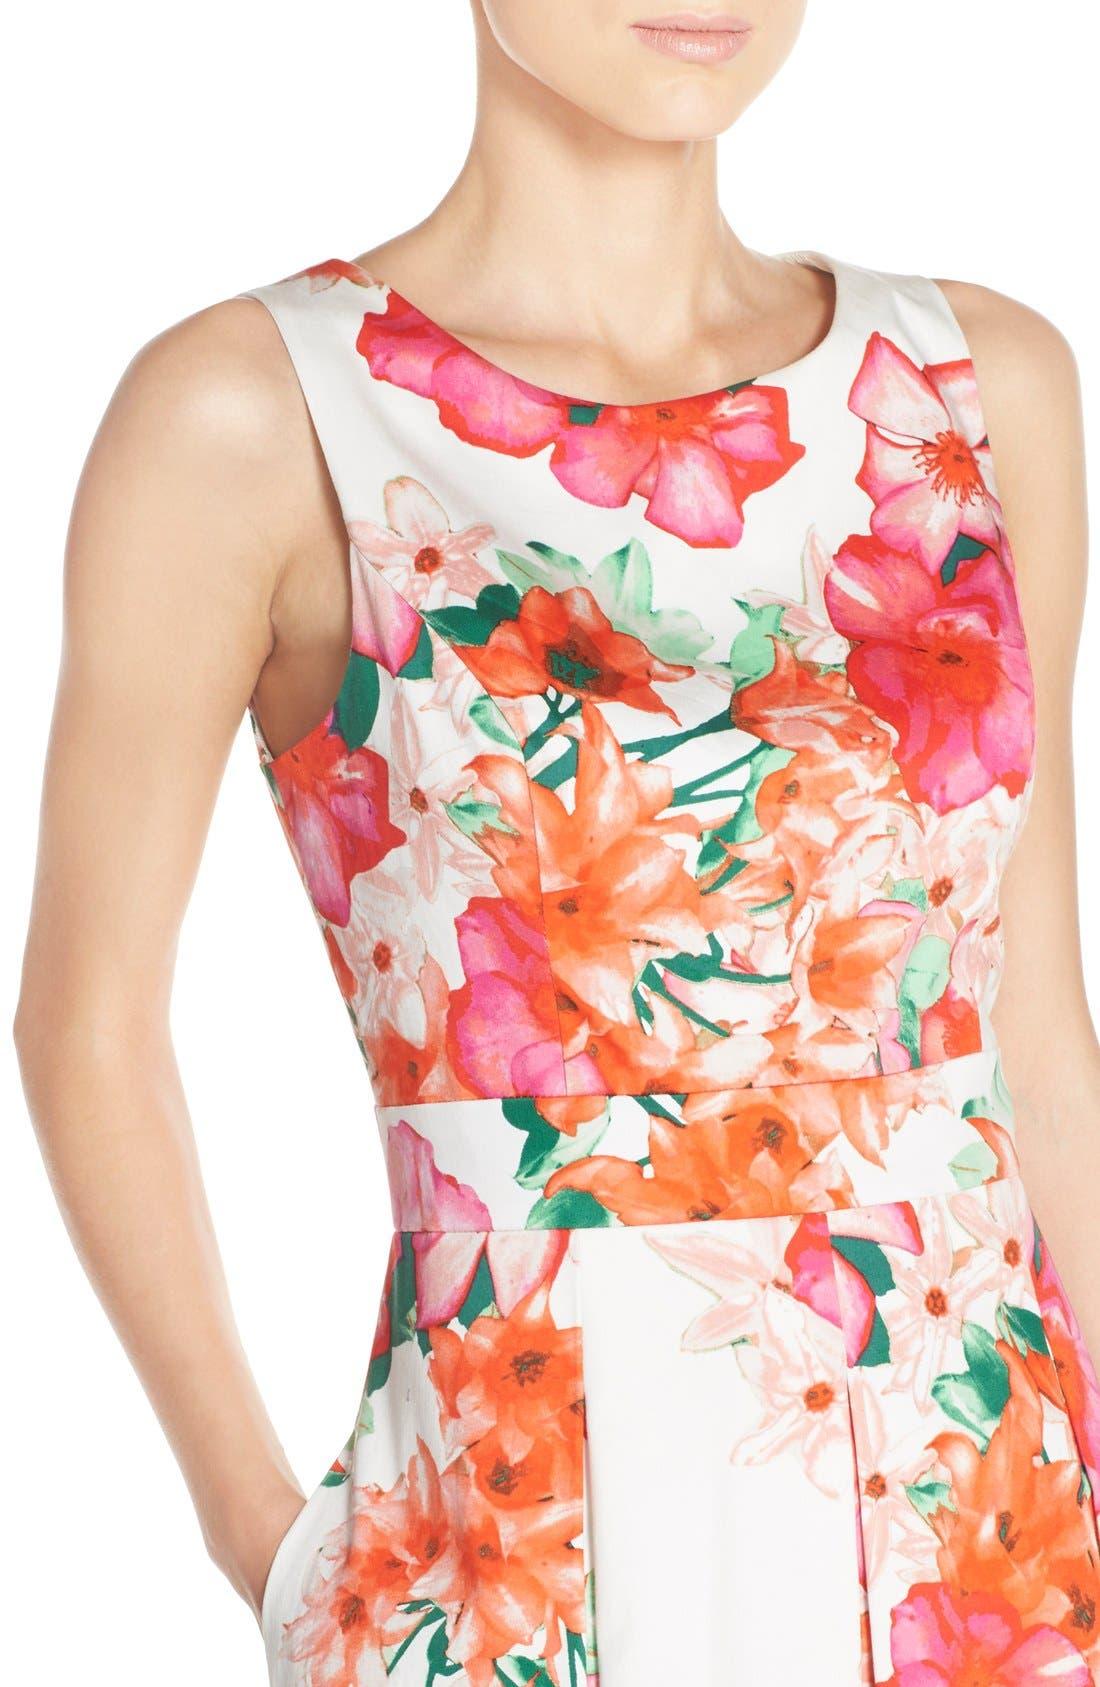 Floral Print Fit & Flare Dress,                             Alternate thumbnail 4, color,                             Pink/ Orange/ Green